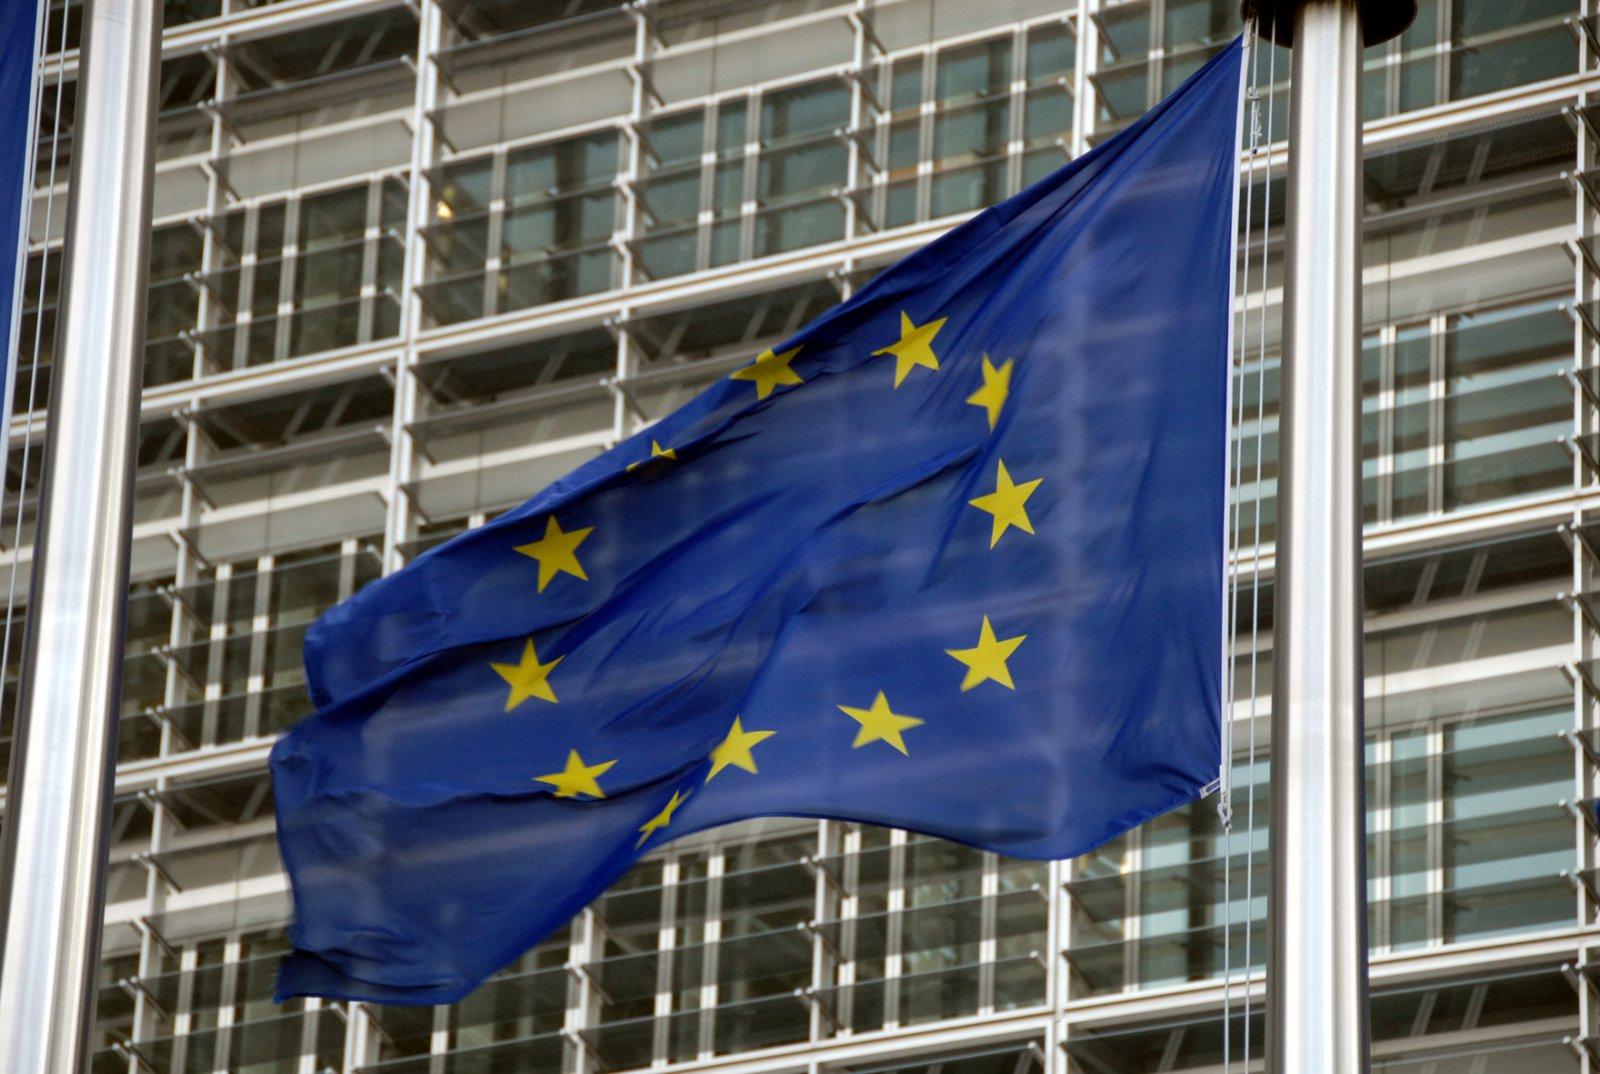 Edifici Berlaymont seu de la Comissió Europea a Brusel·les